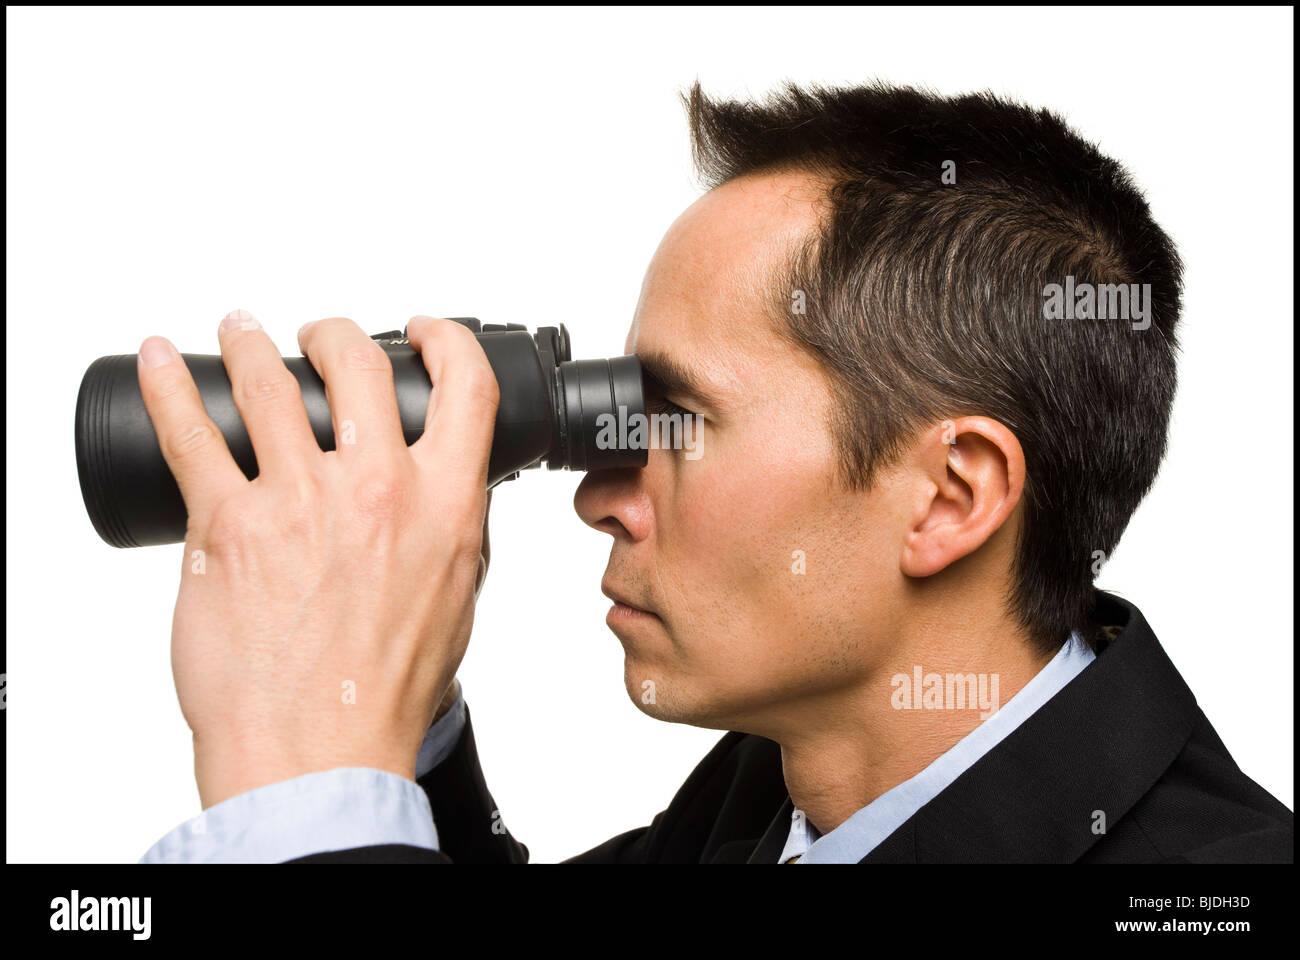 businessperson with binoculars - Stock Image